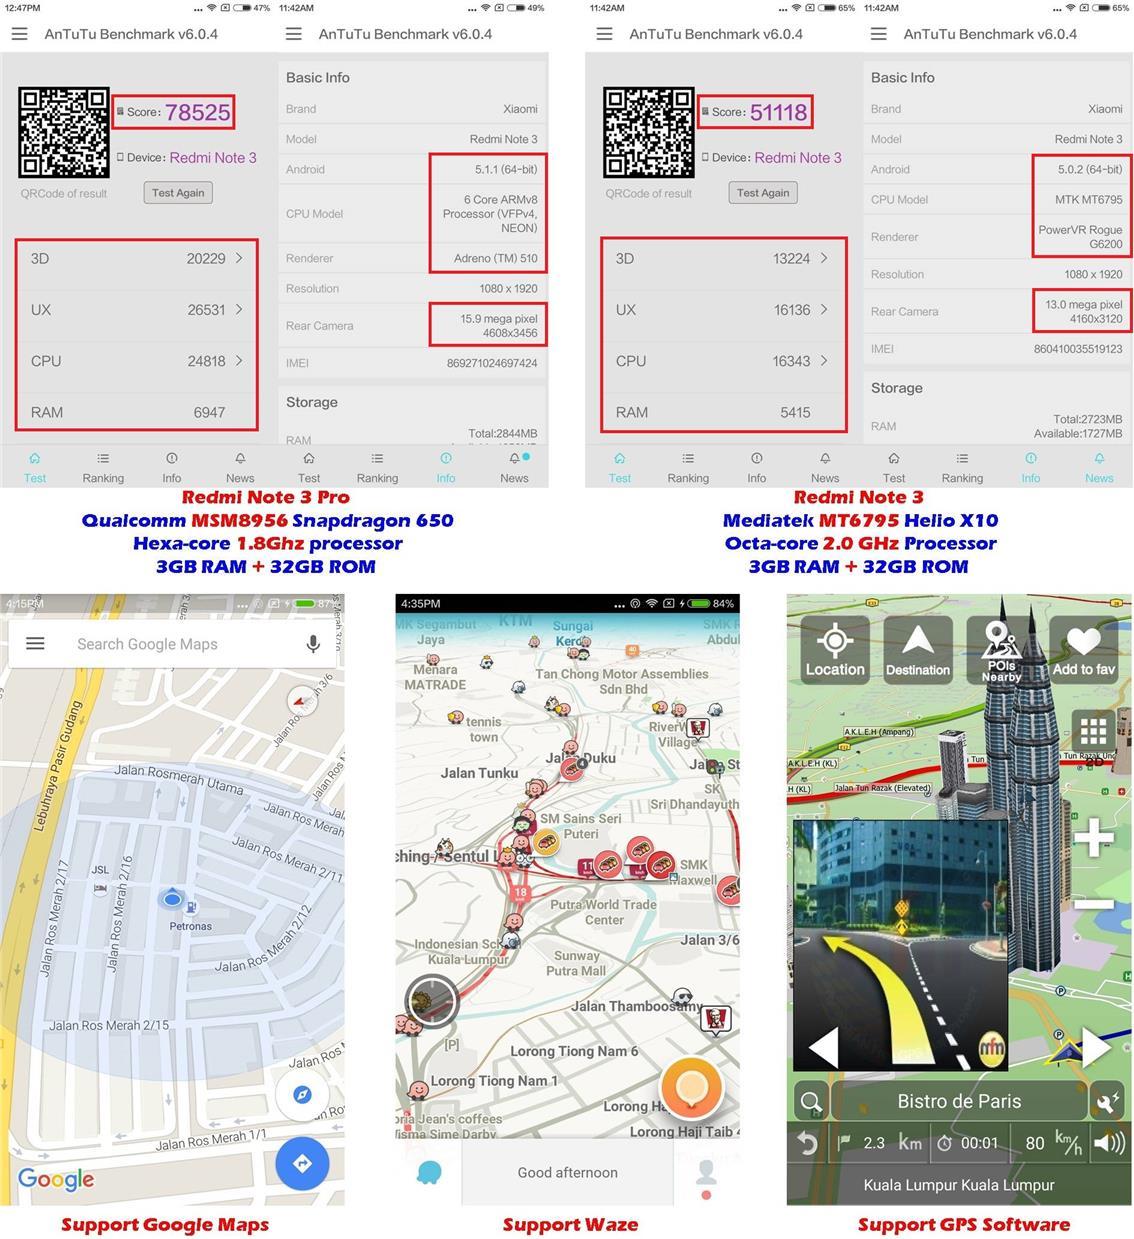 Xiaomi Redmi Note 3 Pro Snapdragon 650 (3GB+32GB ROM) Global Version!